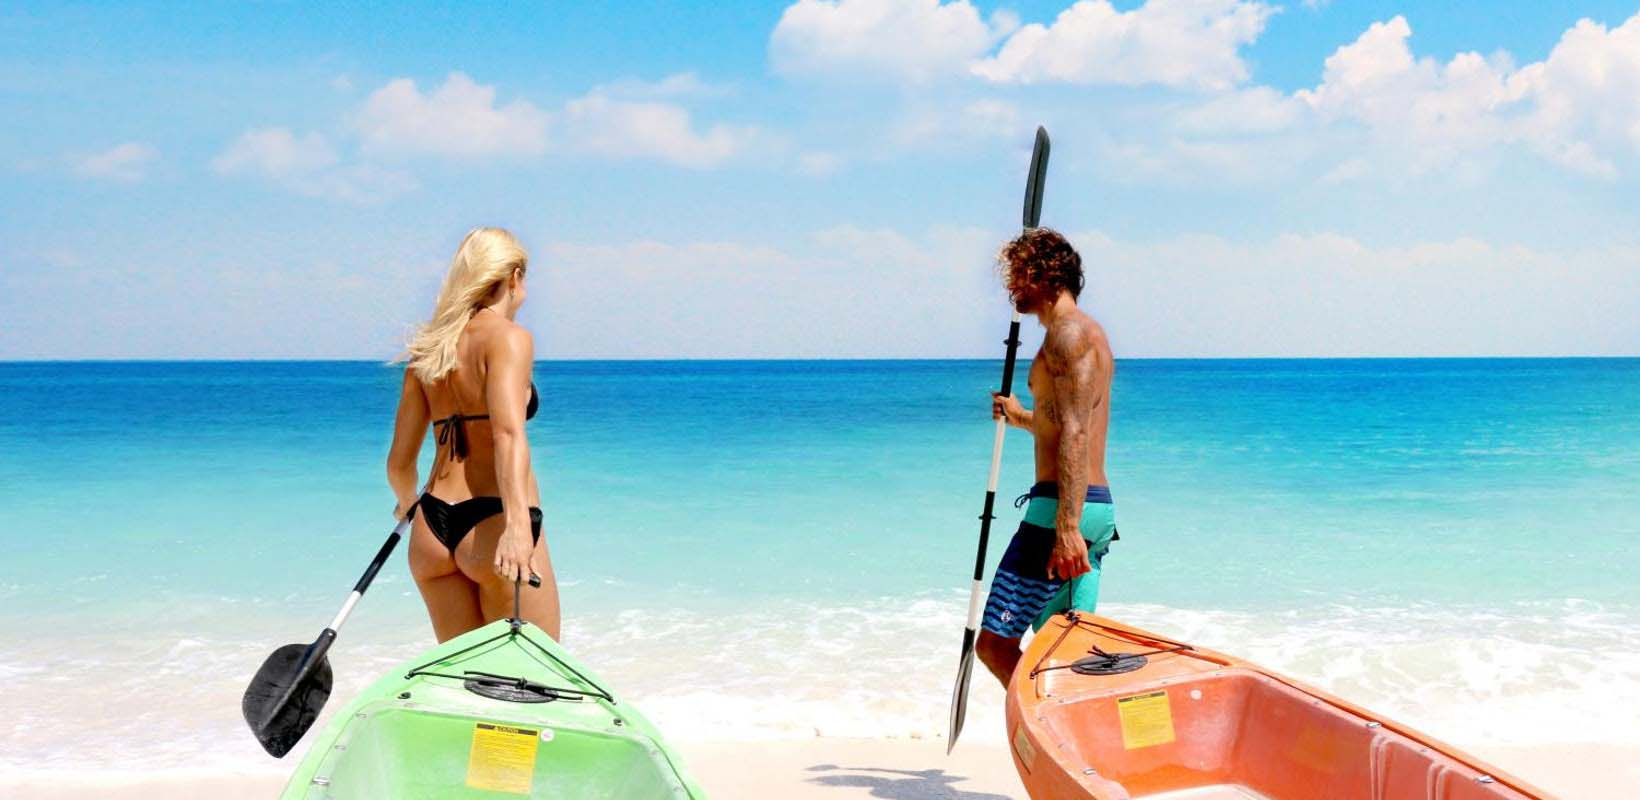 Economy or Premium Day Trip to Bimini Bahamas with transportation